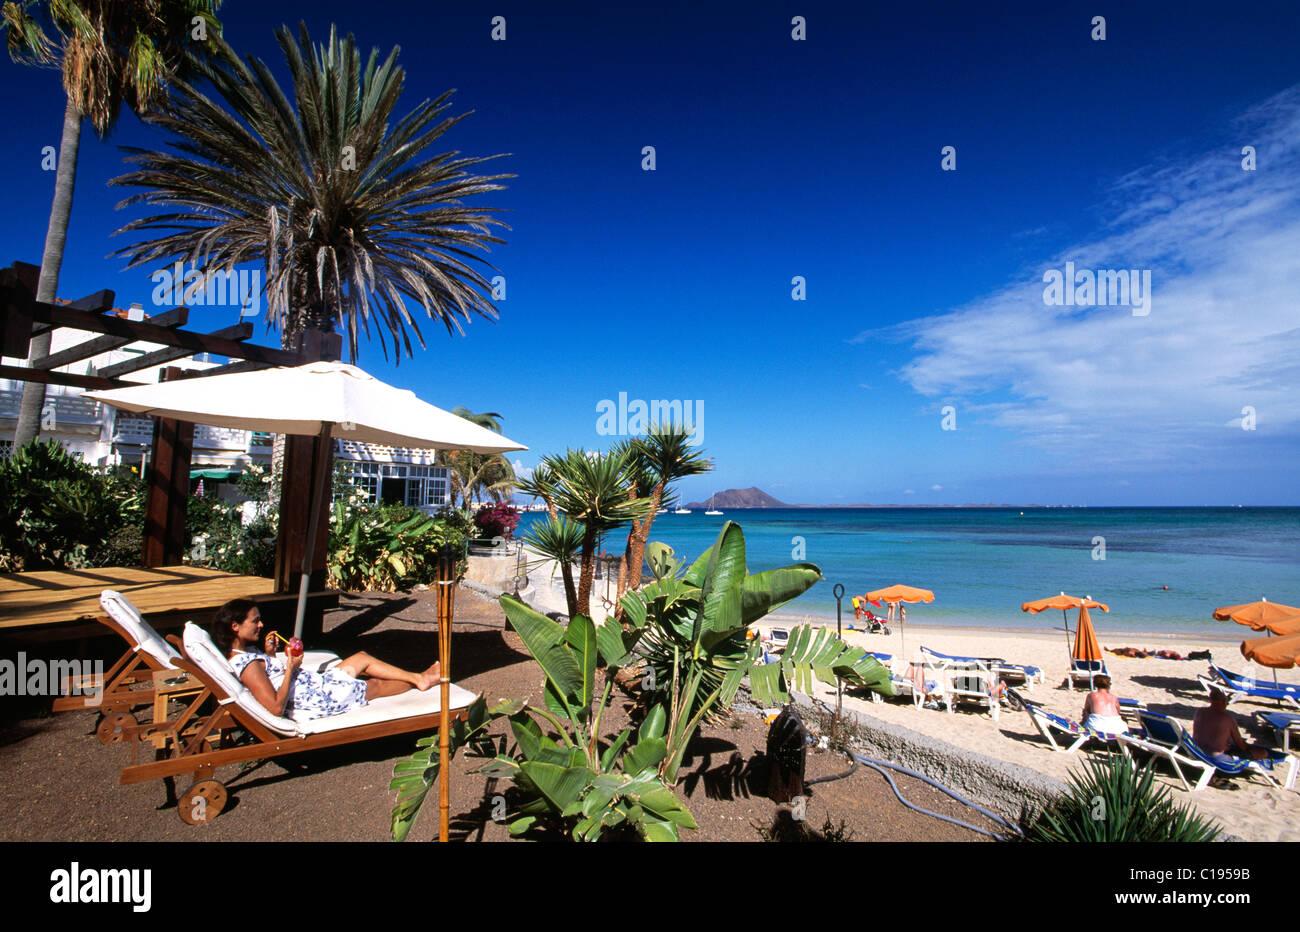 Strand-Bar in Corralejo, Fuerteventura, Kanarische Inseln, Spanien, Europa Stockbild